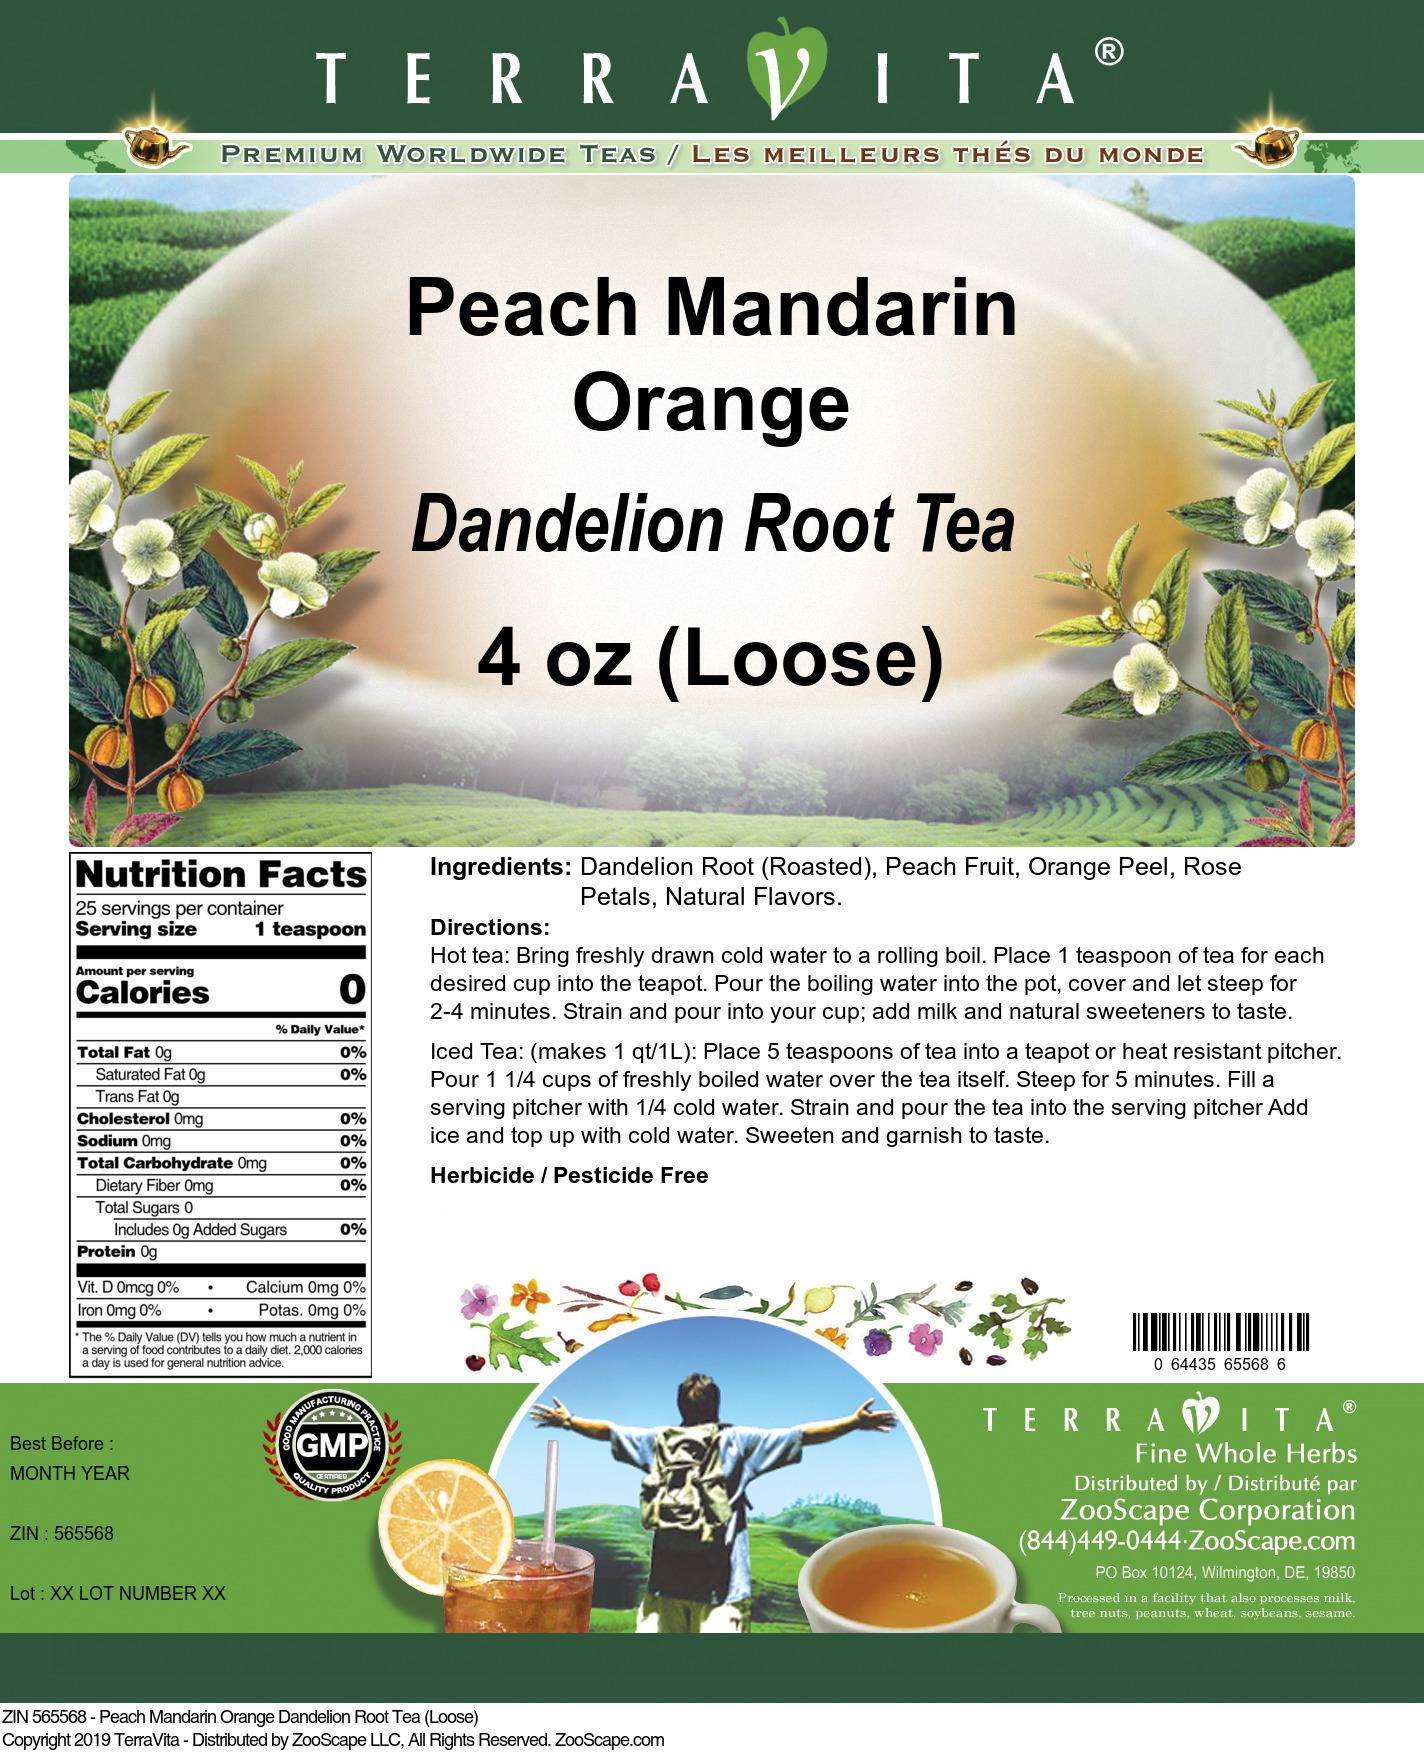 Peach Mandarin Orange Dandelion Root Tea (Loose)